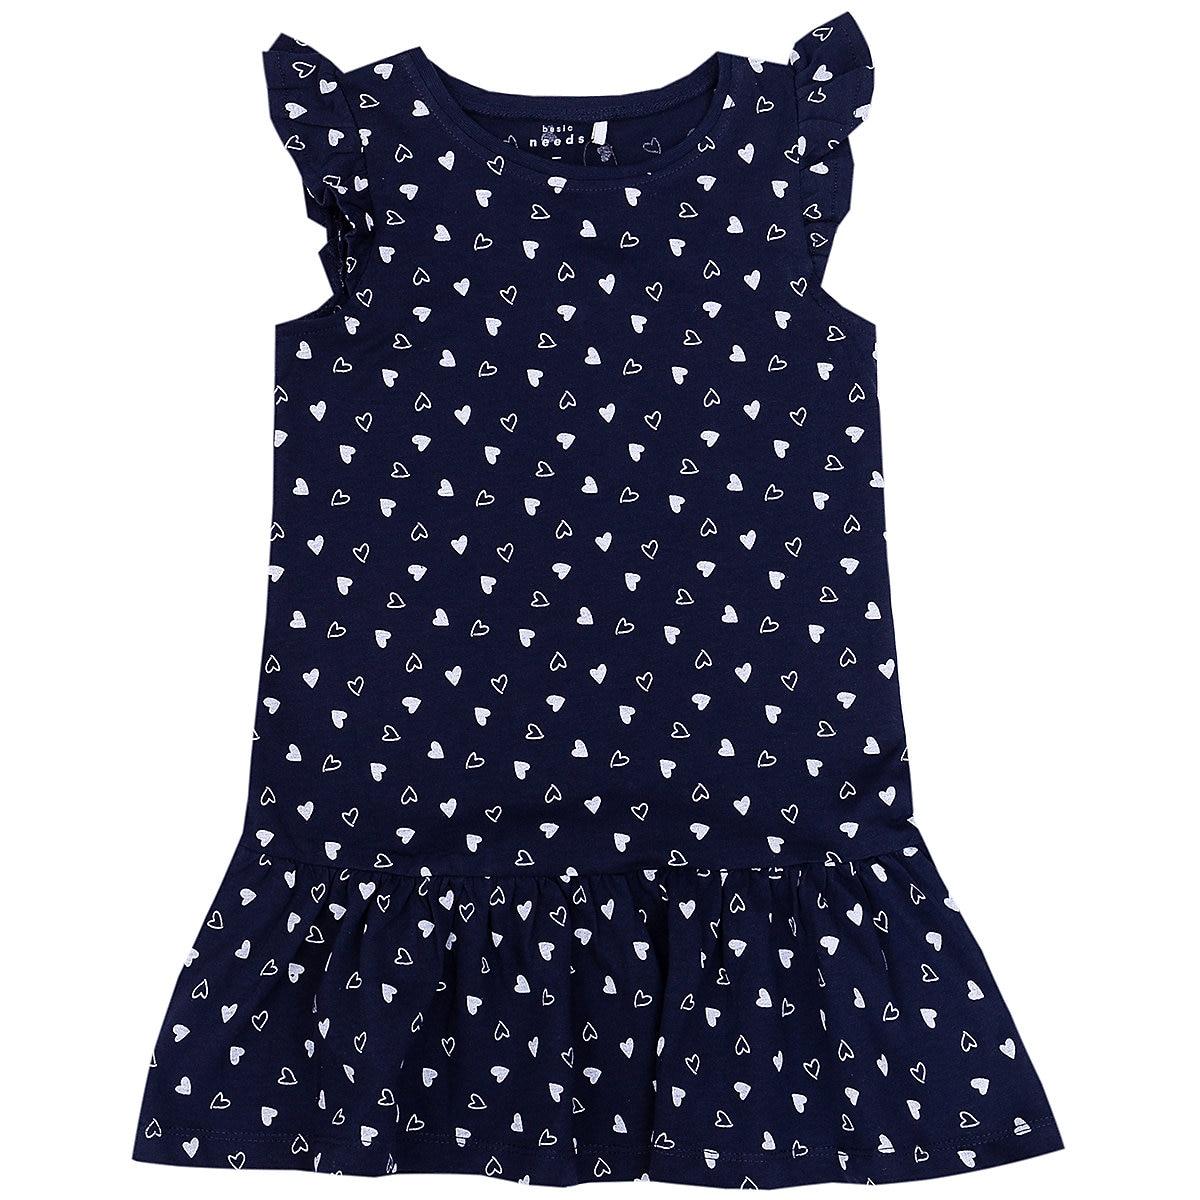 Фото - NAME IT Dresses 9383944 dress for girls baby clothing name it dresses 10626724 dress for girls baby clothing